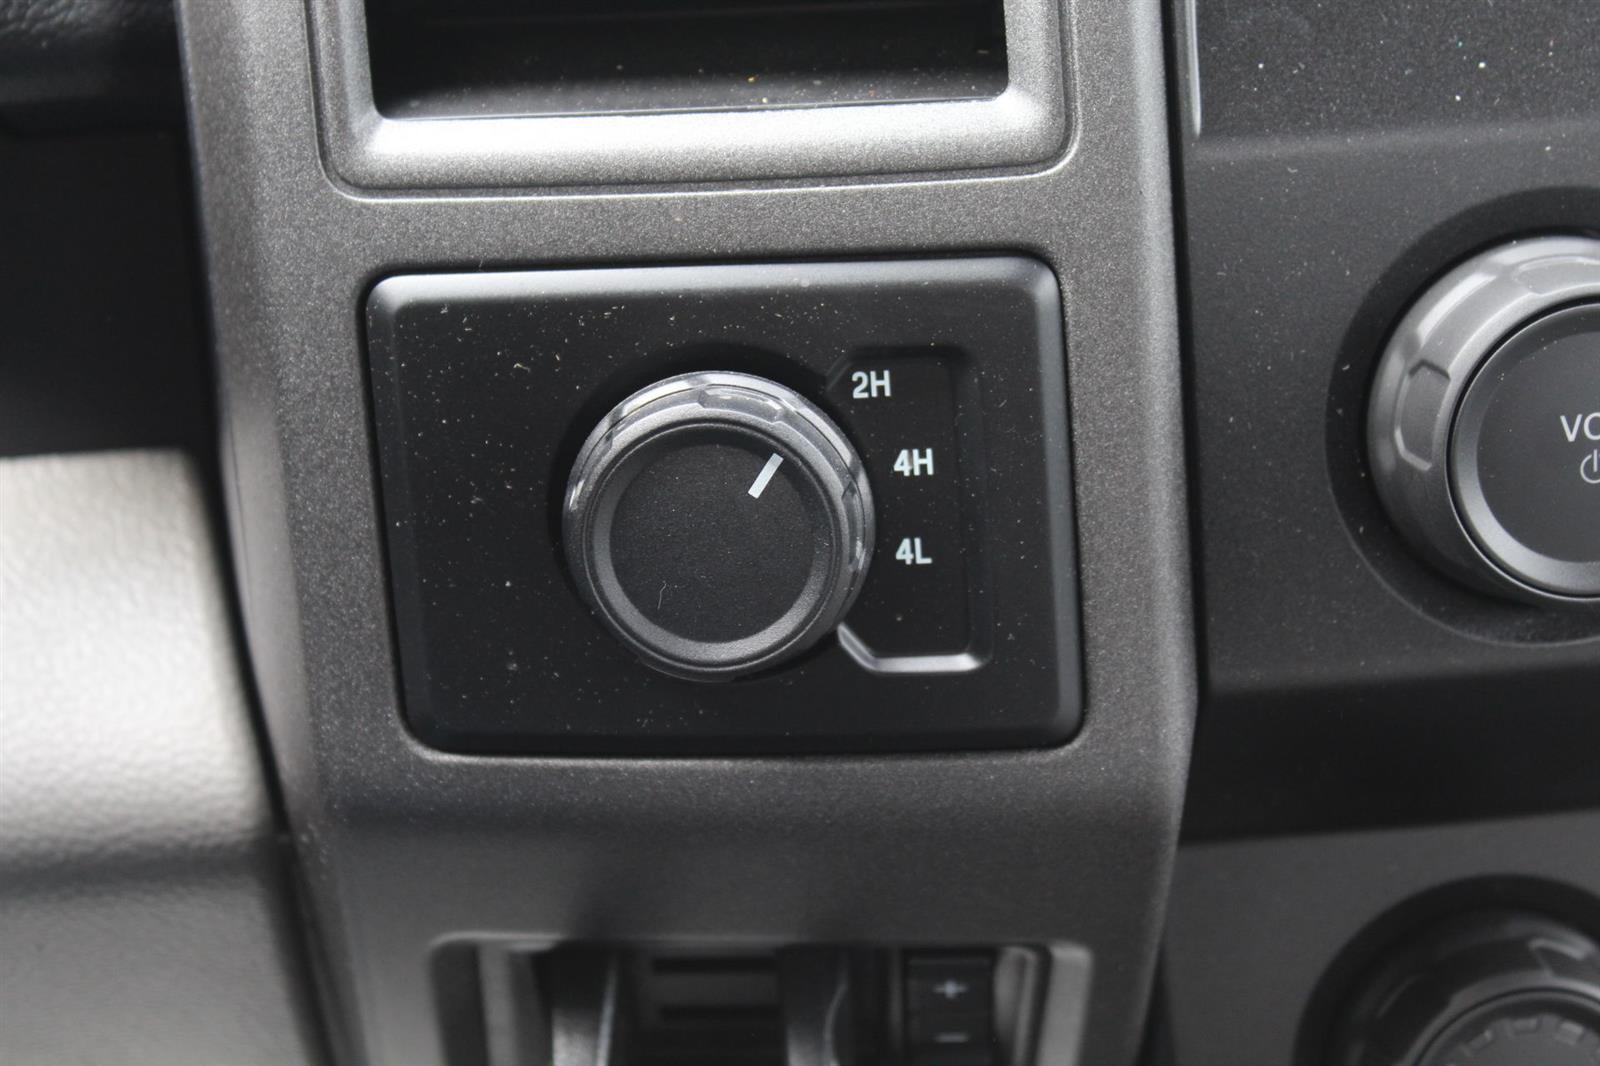 2020 Ford F-550 Regular Cab DRW 4x4, Knapheide Rigid Side Dump Body #E9514 - photo 17